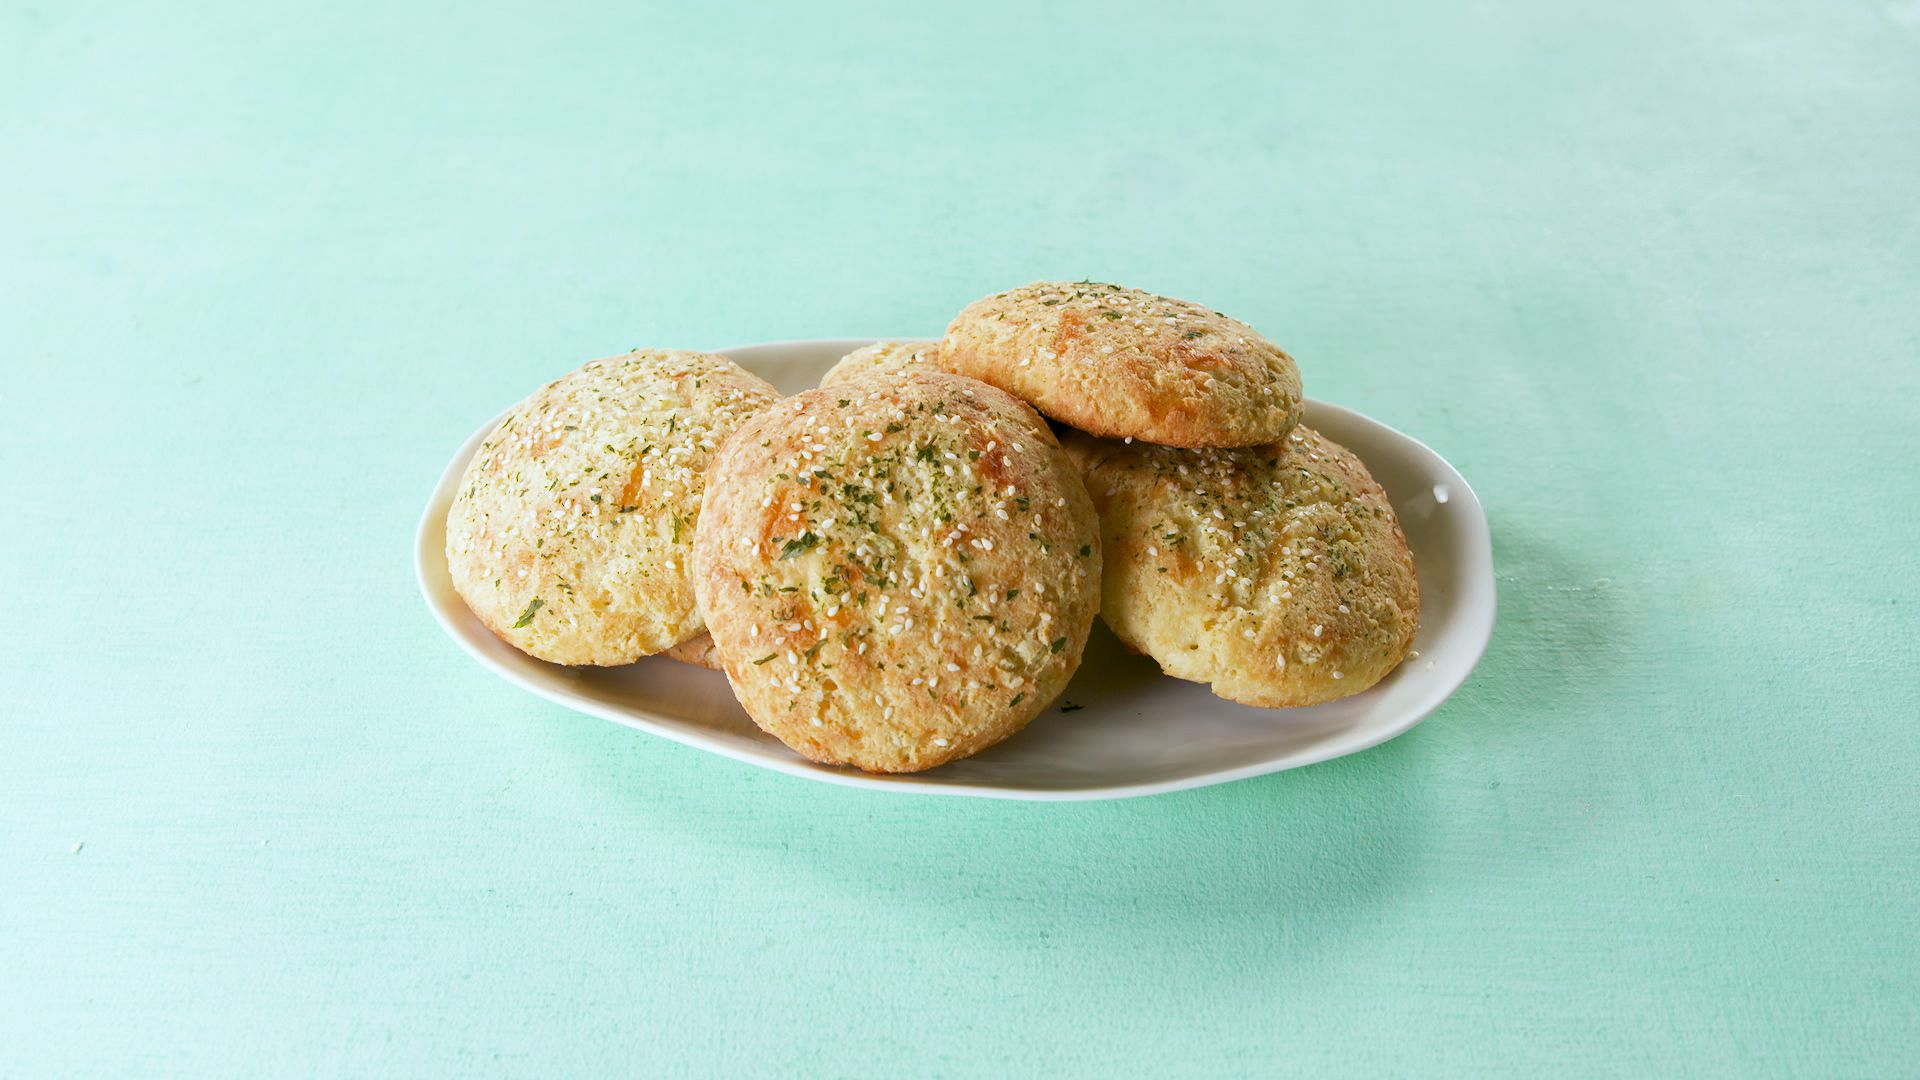 Best Keto Burger Buns Recipe - How to Make Keto Burger Buns